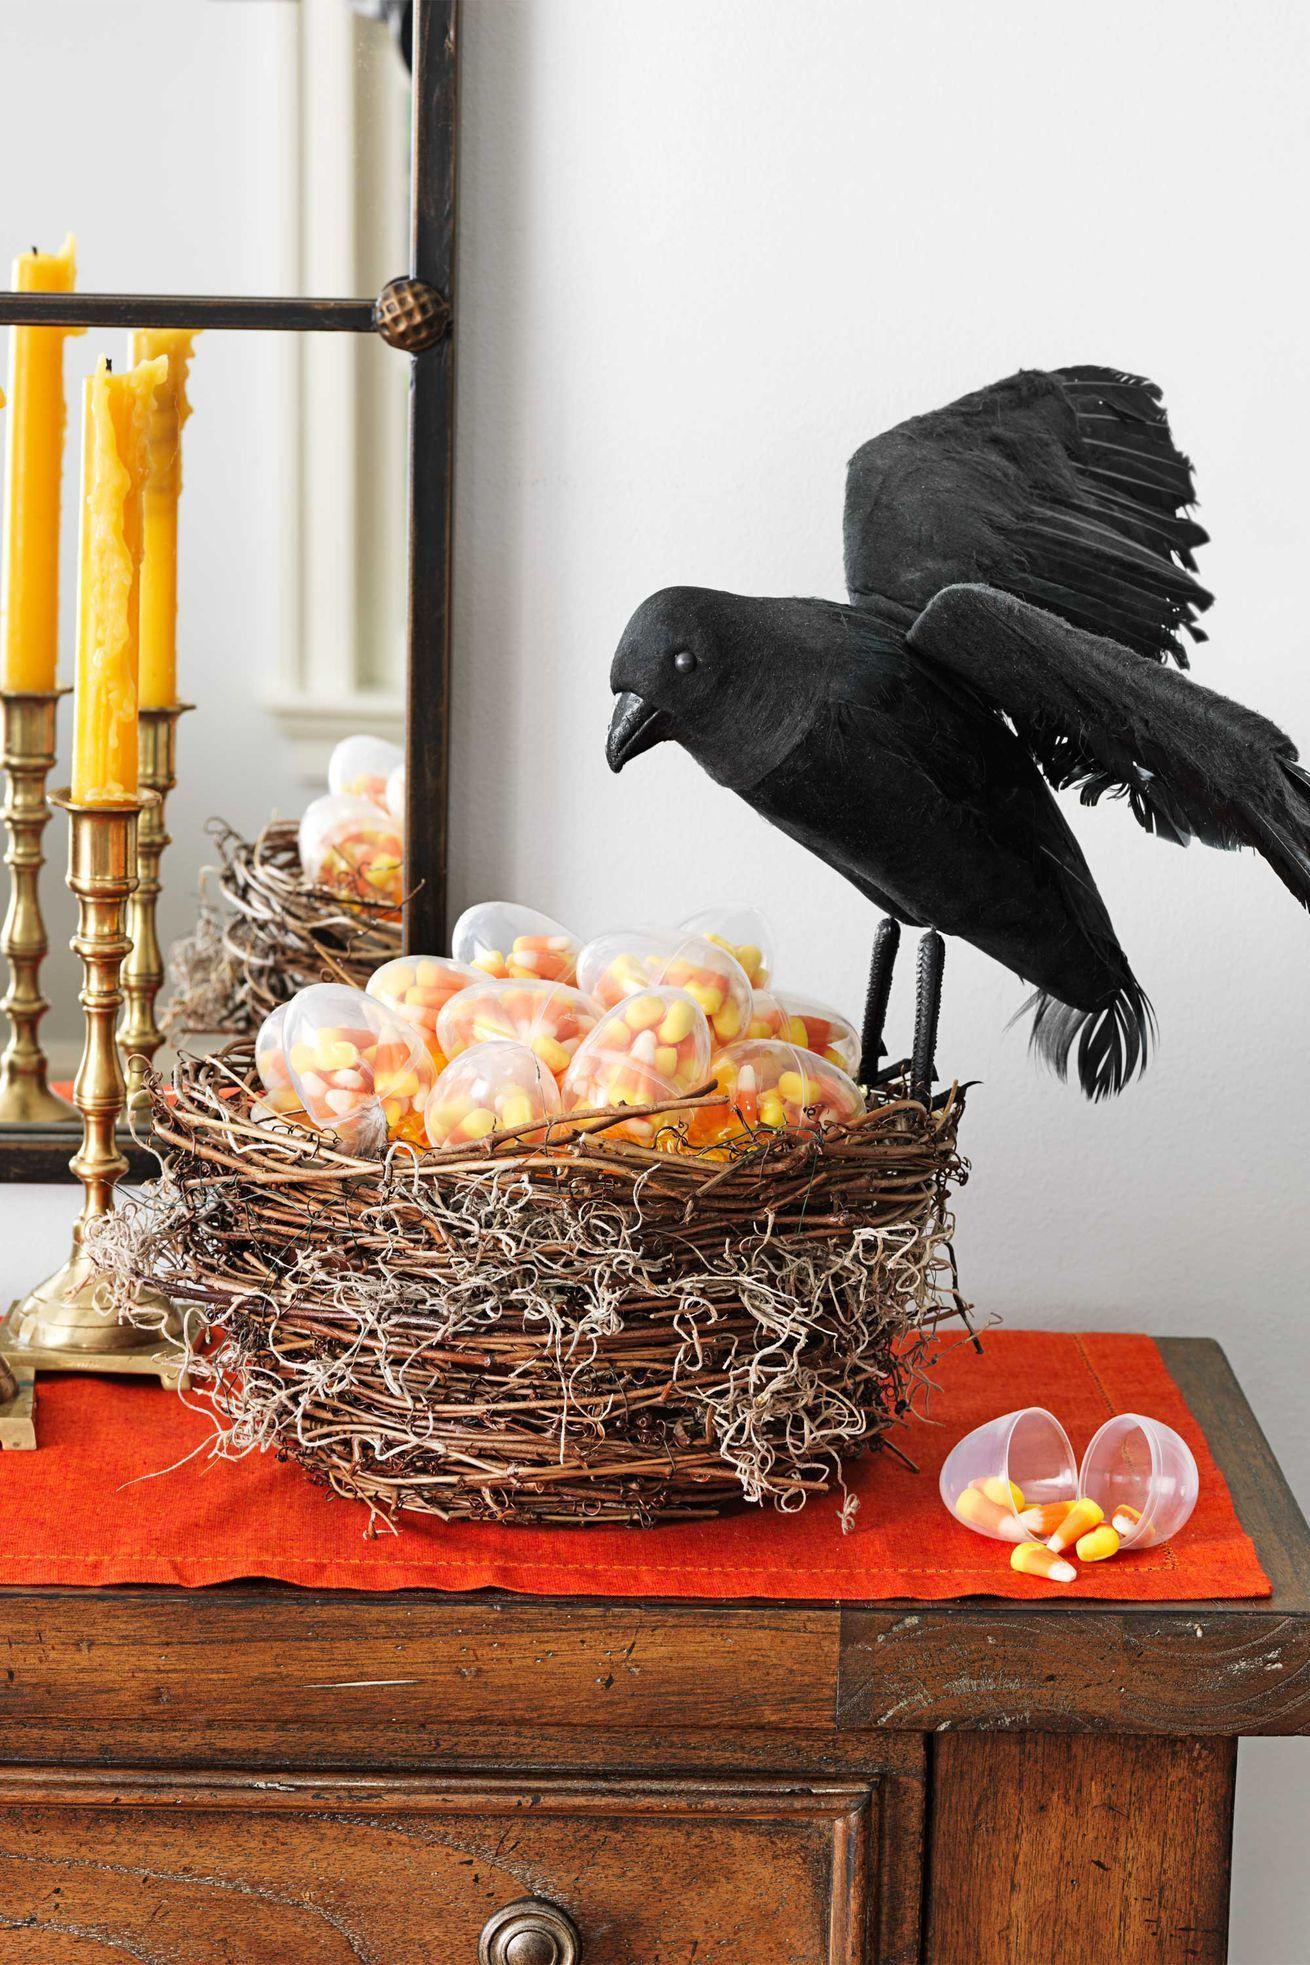 50 Easy Halloween Decorations  Spooky Home Decor Ideas For